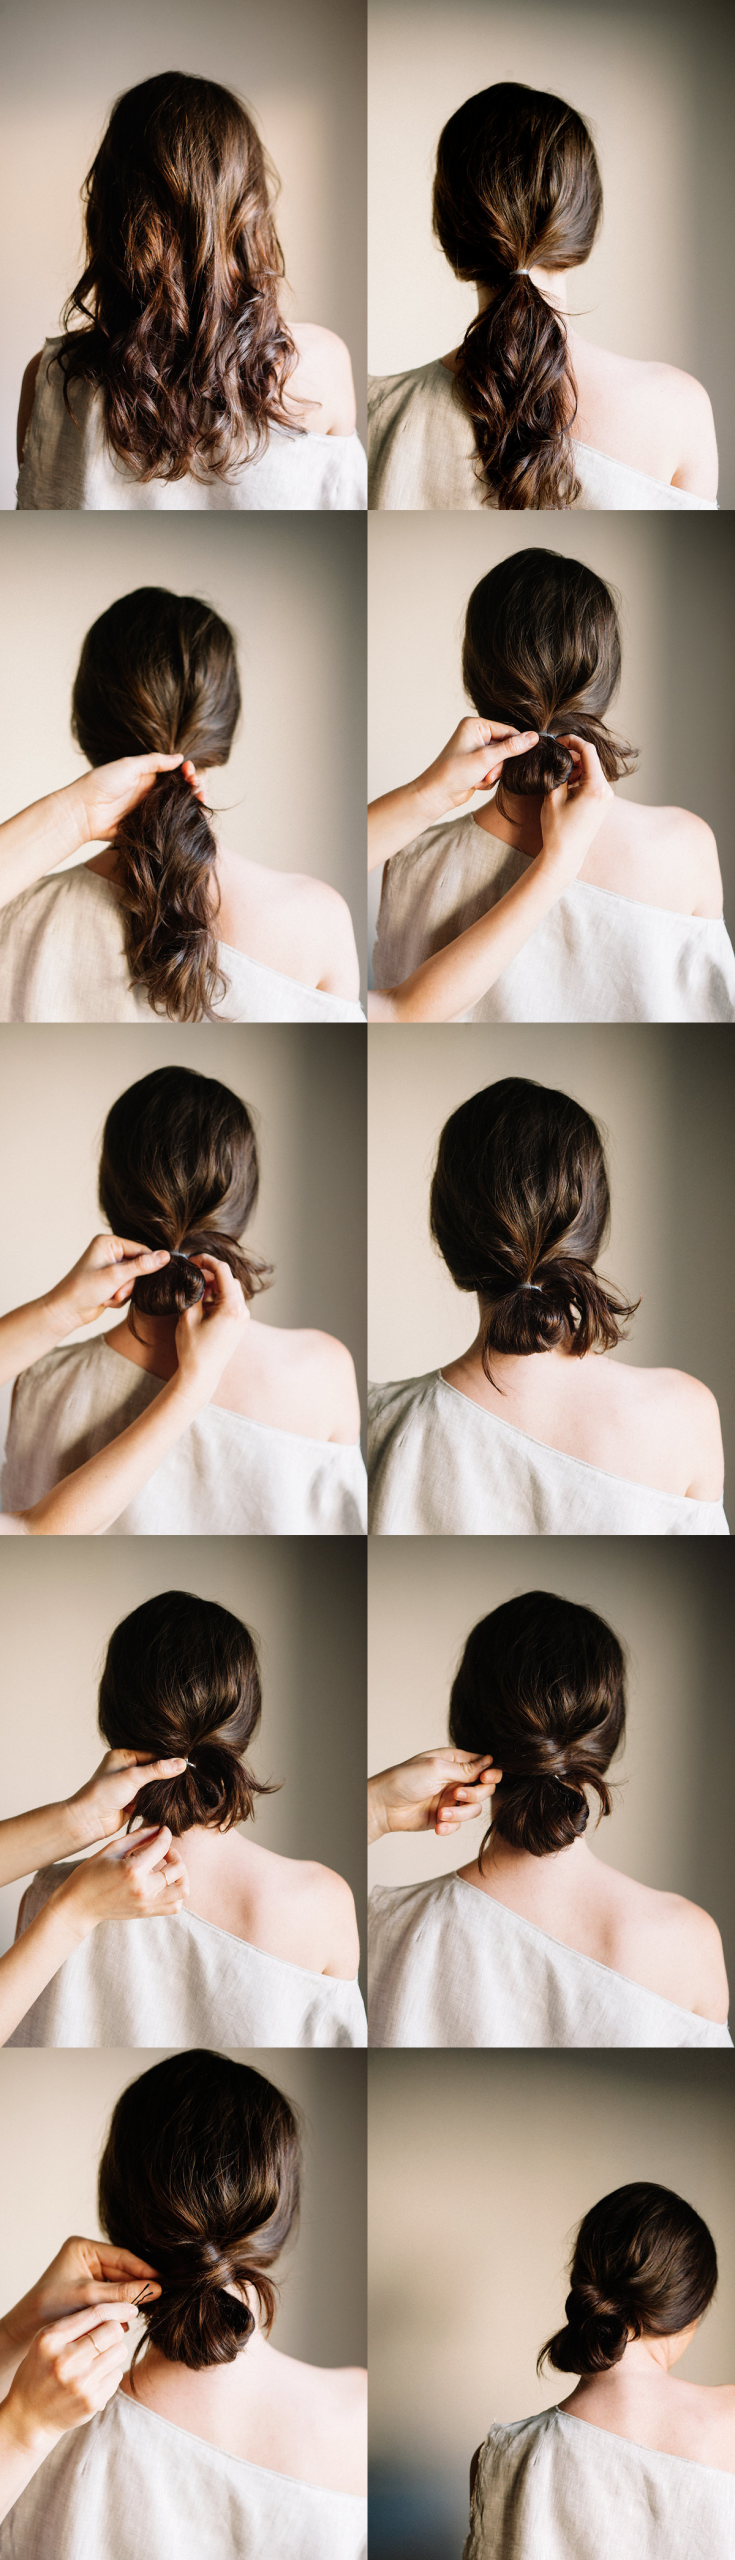 DIY Bridal Hair  DIY Low Knot DIY Wedding Ideas